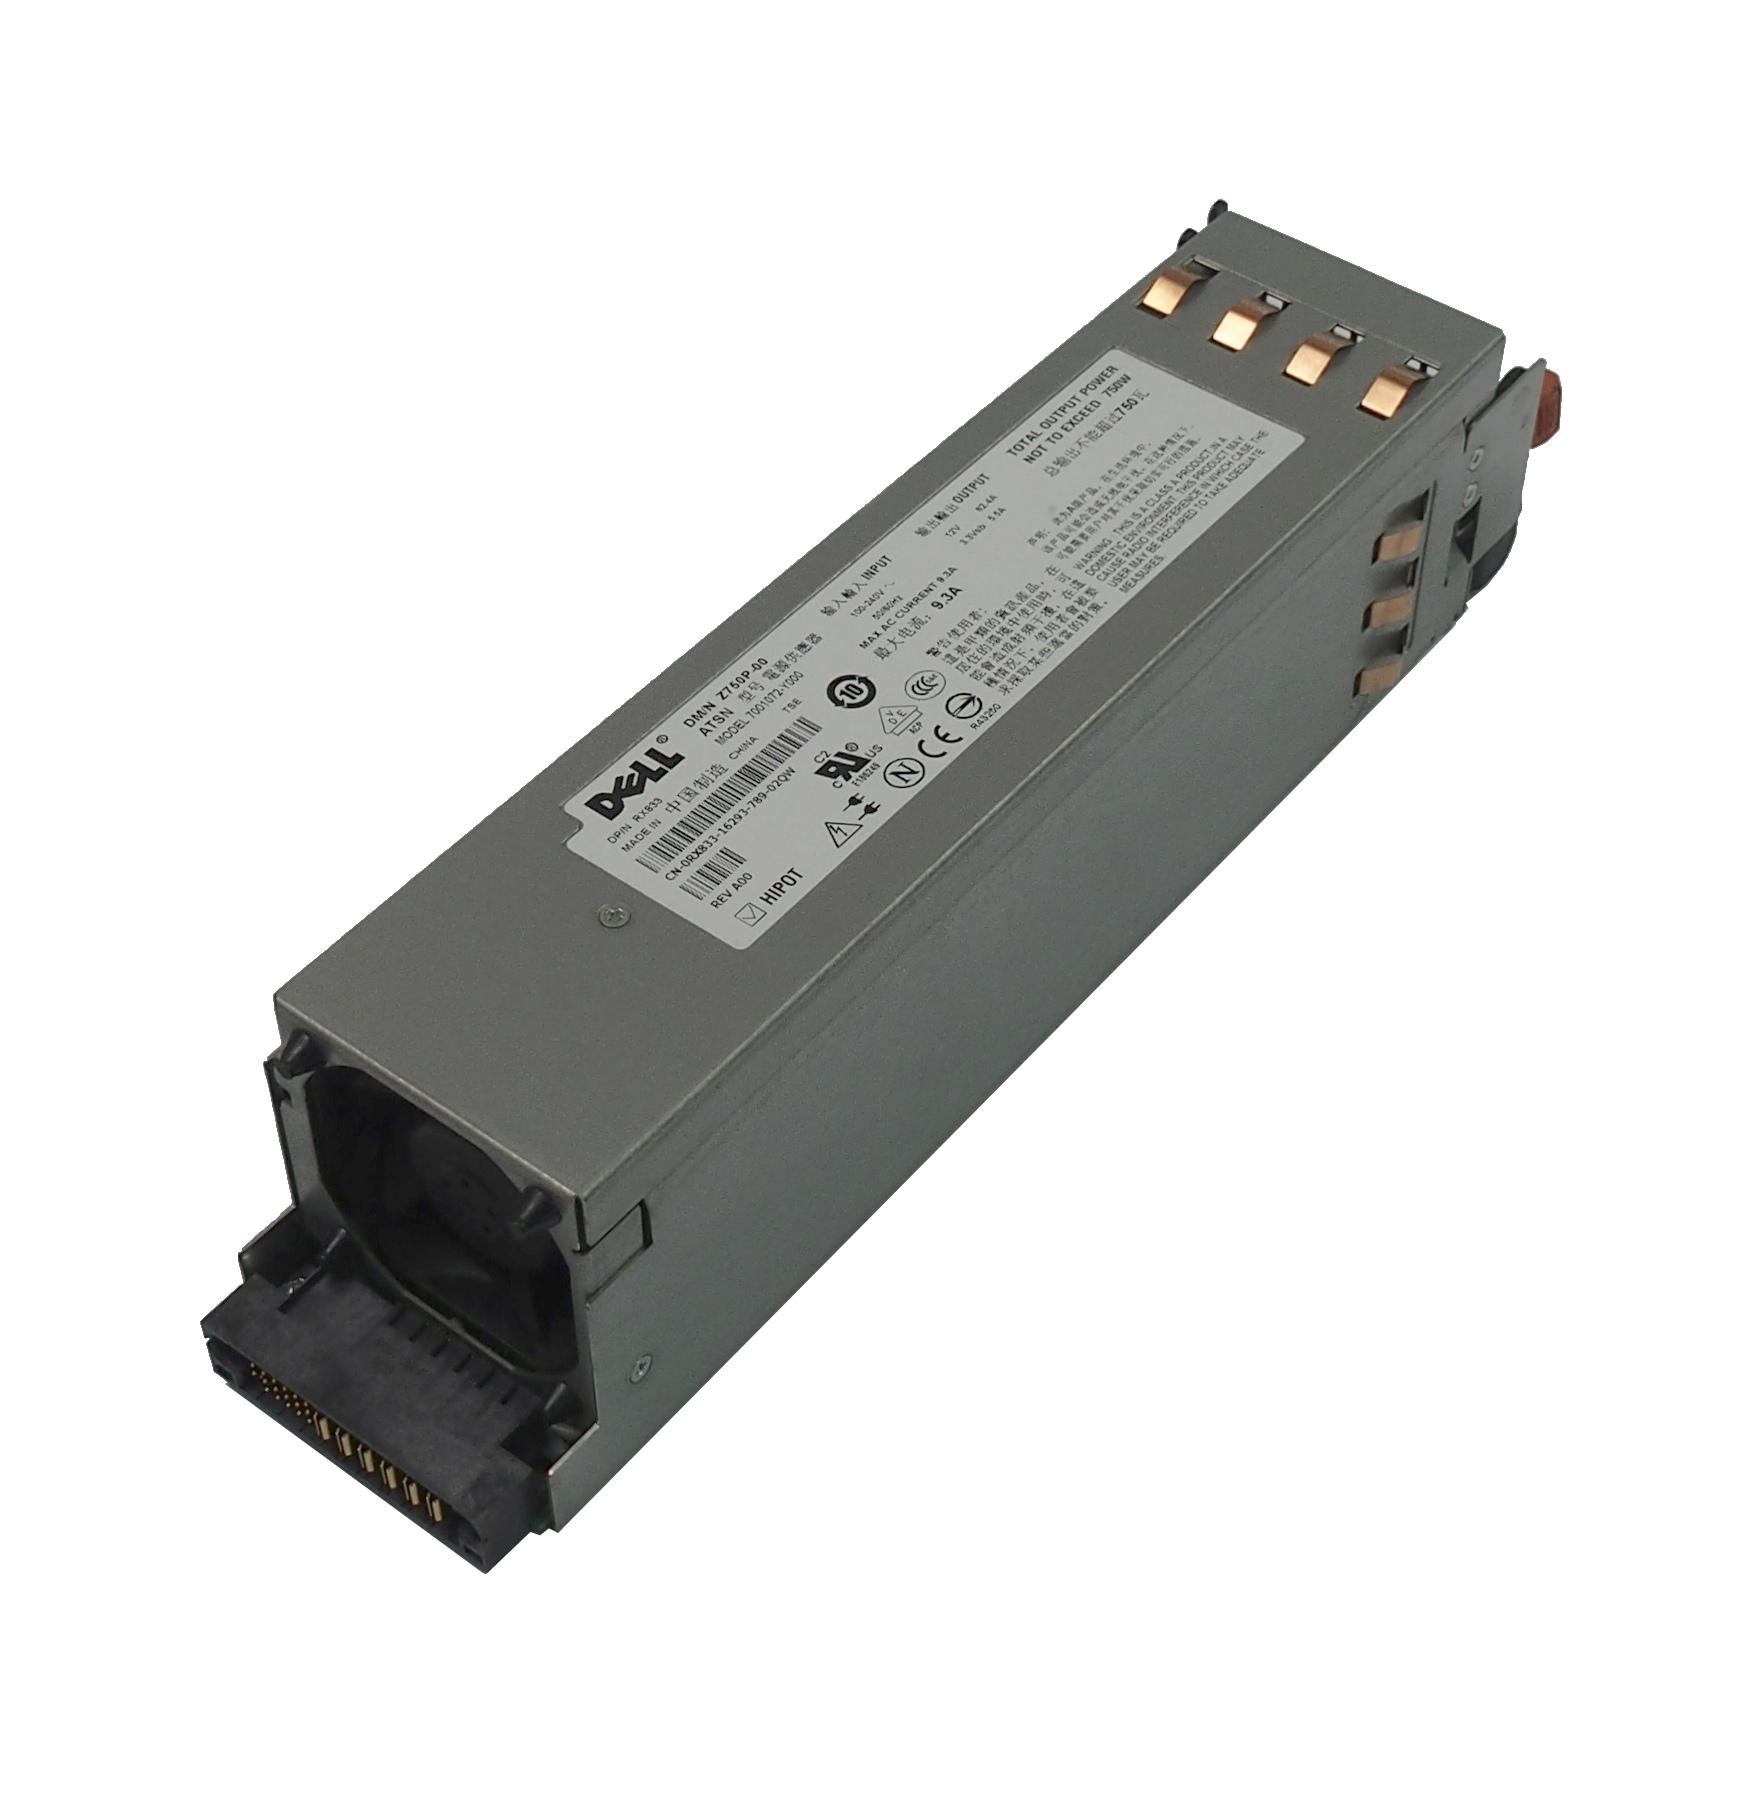 Dell RX833 750W Power Supply PowerEdge 2950 Server